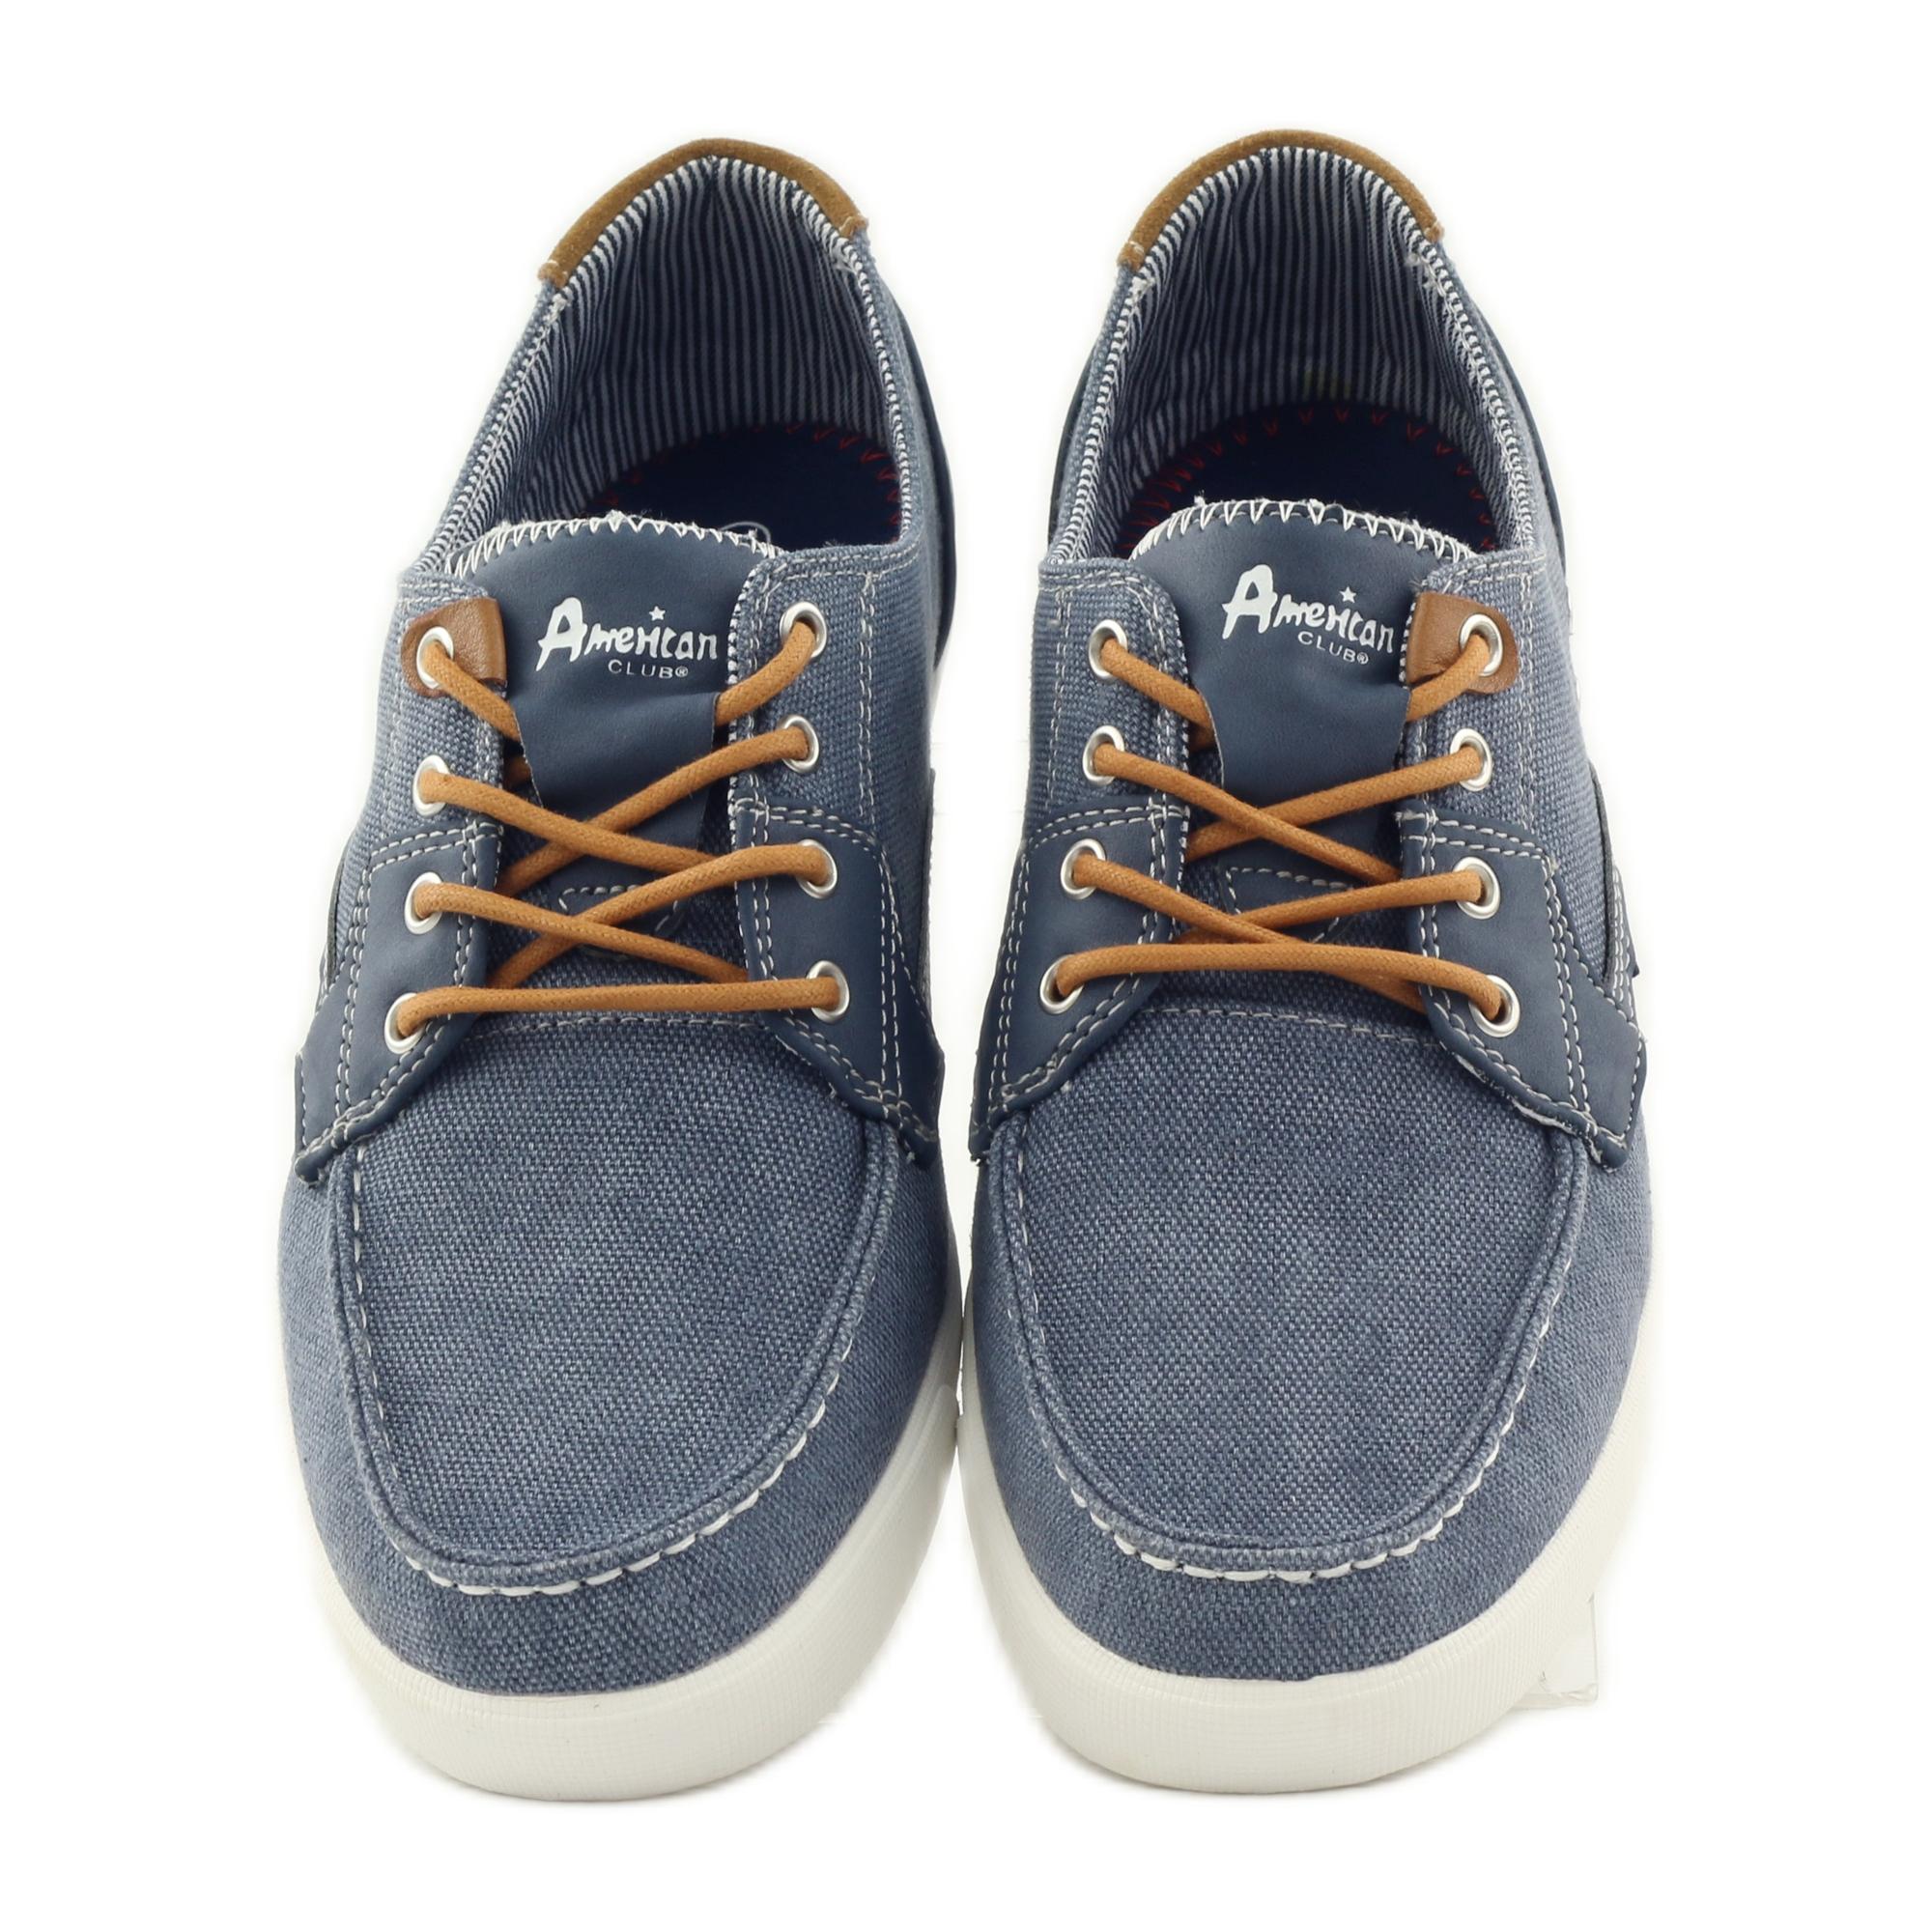 American Club Férfi cipő Amerikai cipők 205081